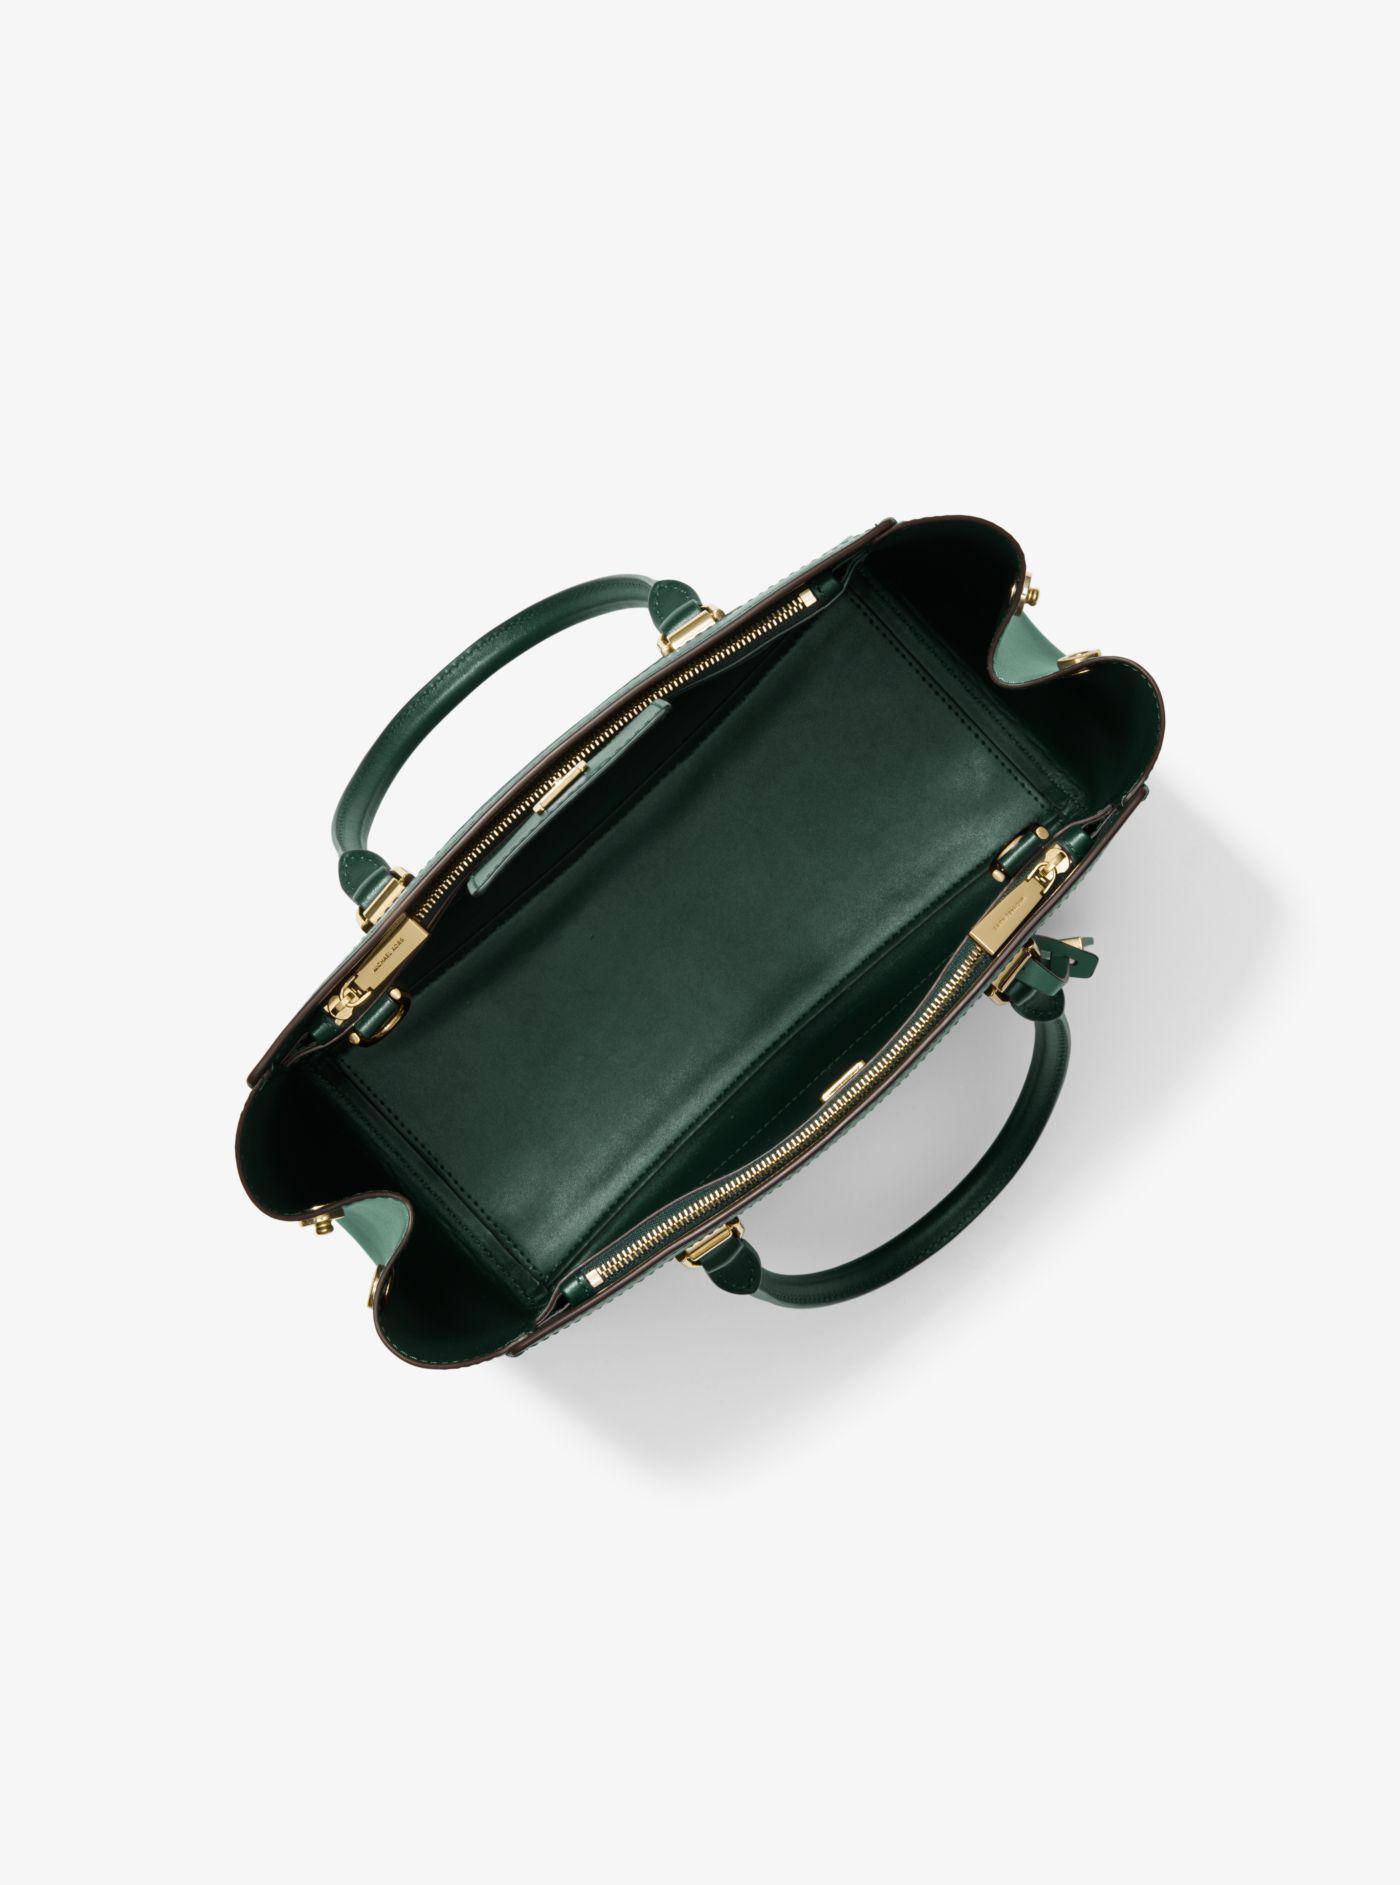 60577fc0cf01 ... good michael kors green benning large two tone leather satchel lyst.  view fullscreen ba646 a8e9a